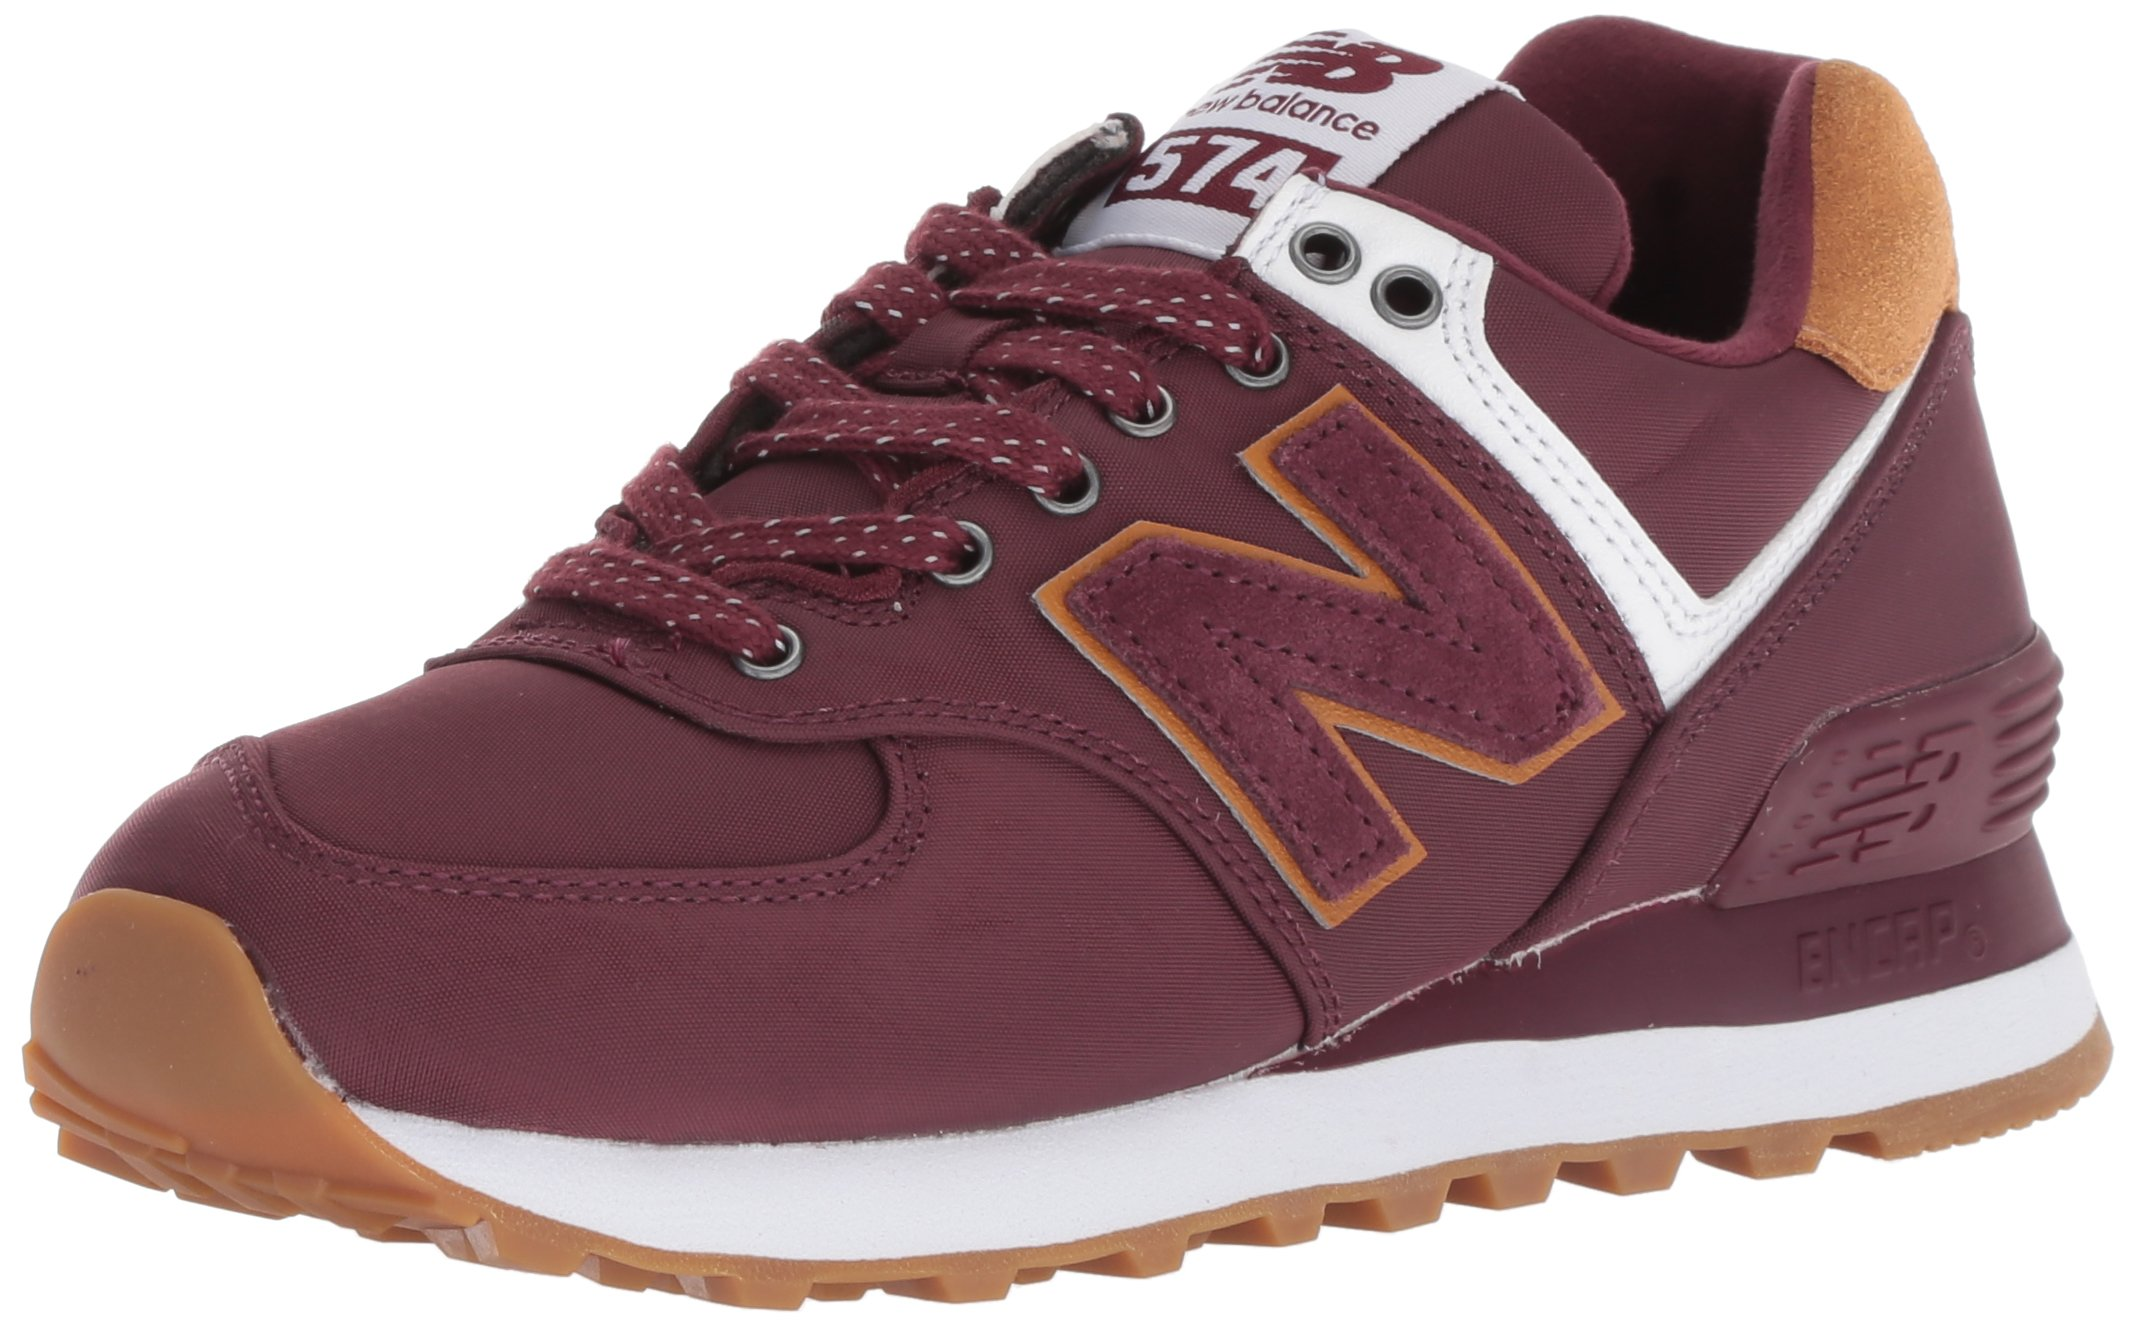 11f7b092a98 New Balance Womens 574 Core Sneaker Burgundy with White 8.5 B US